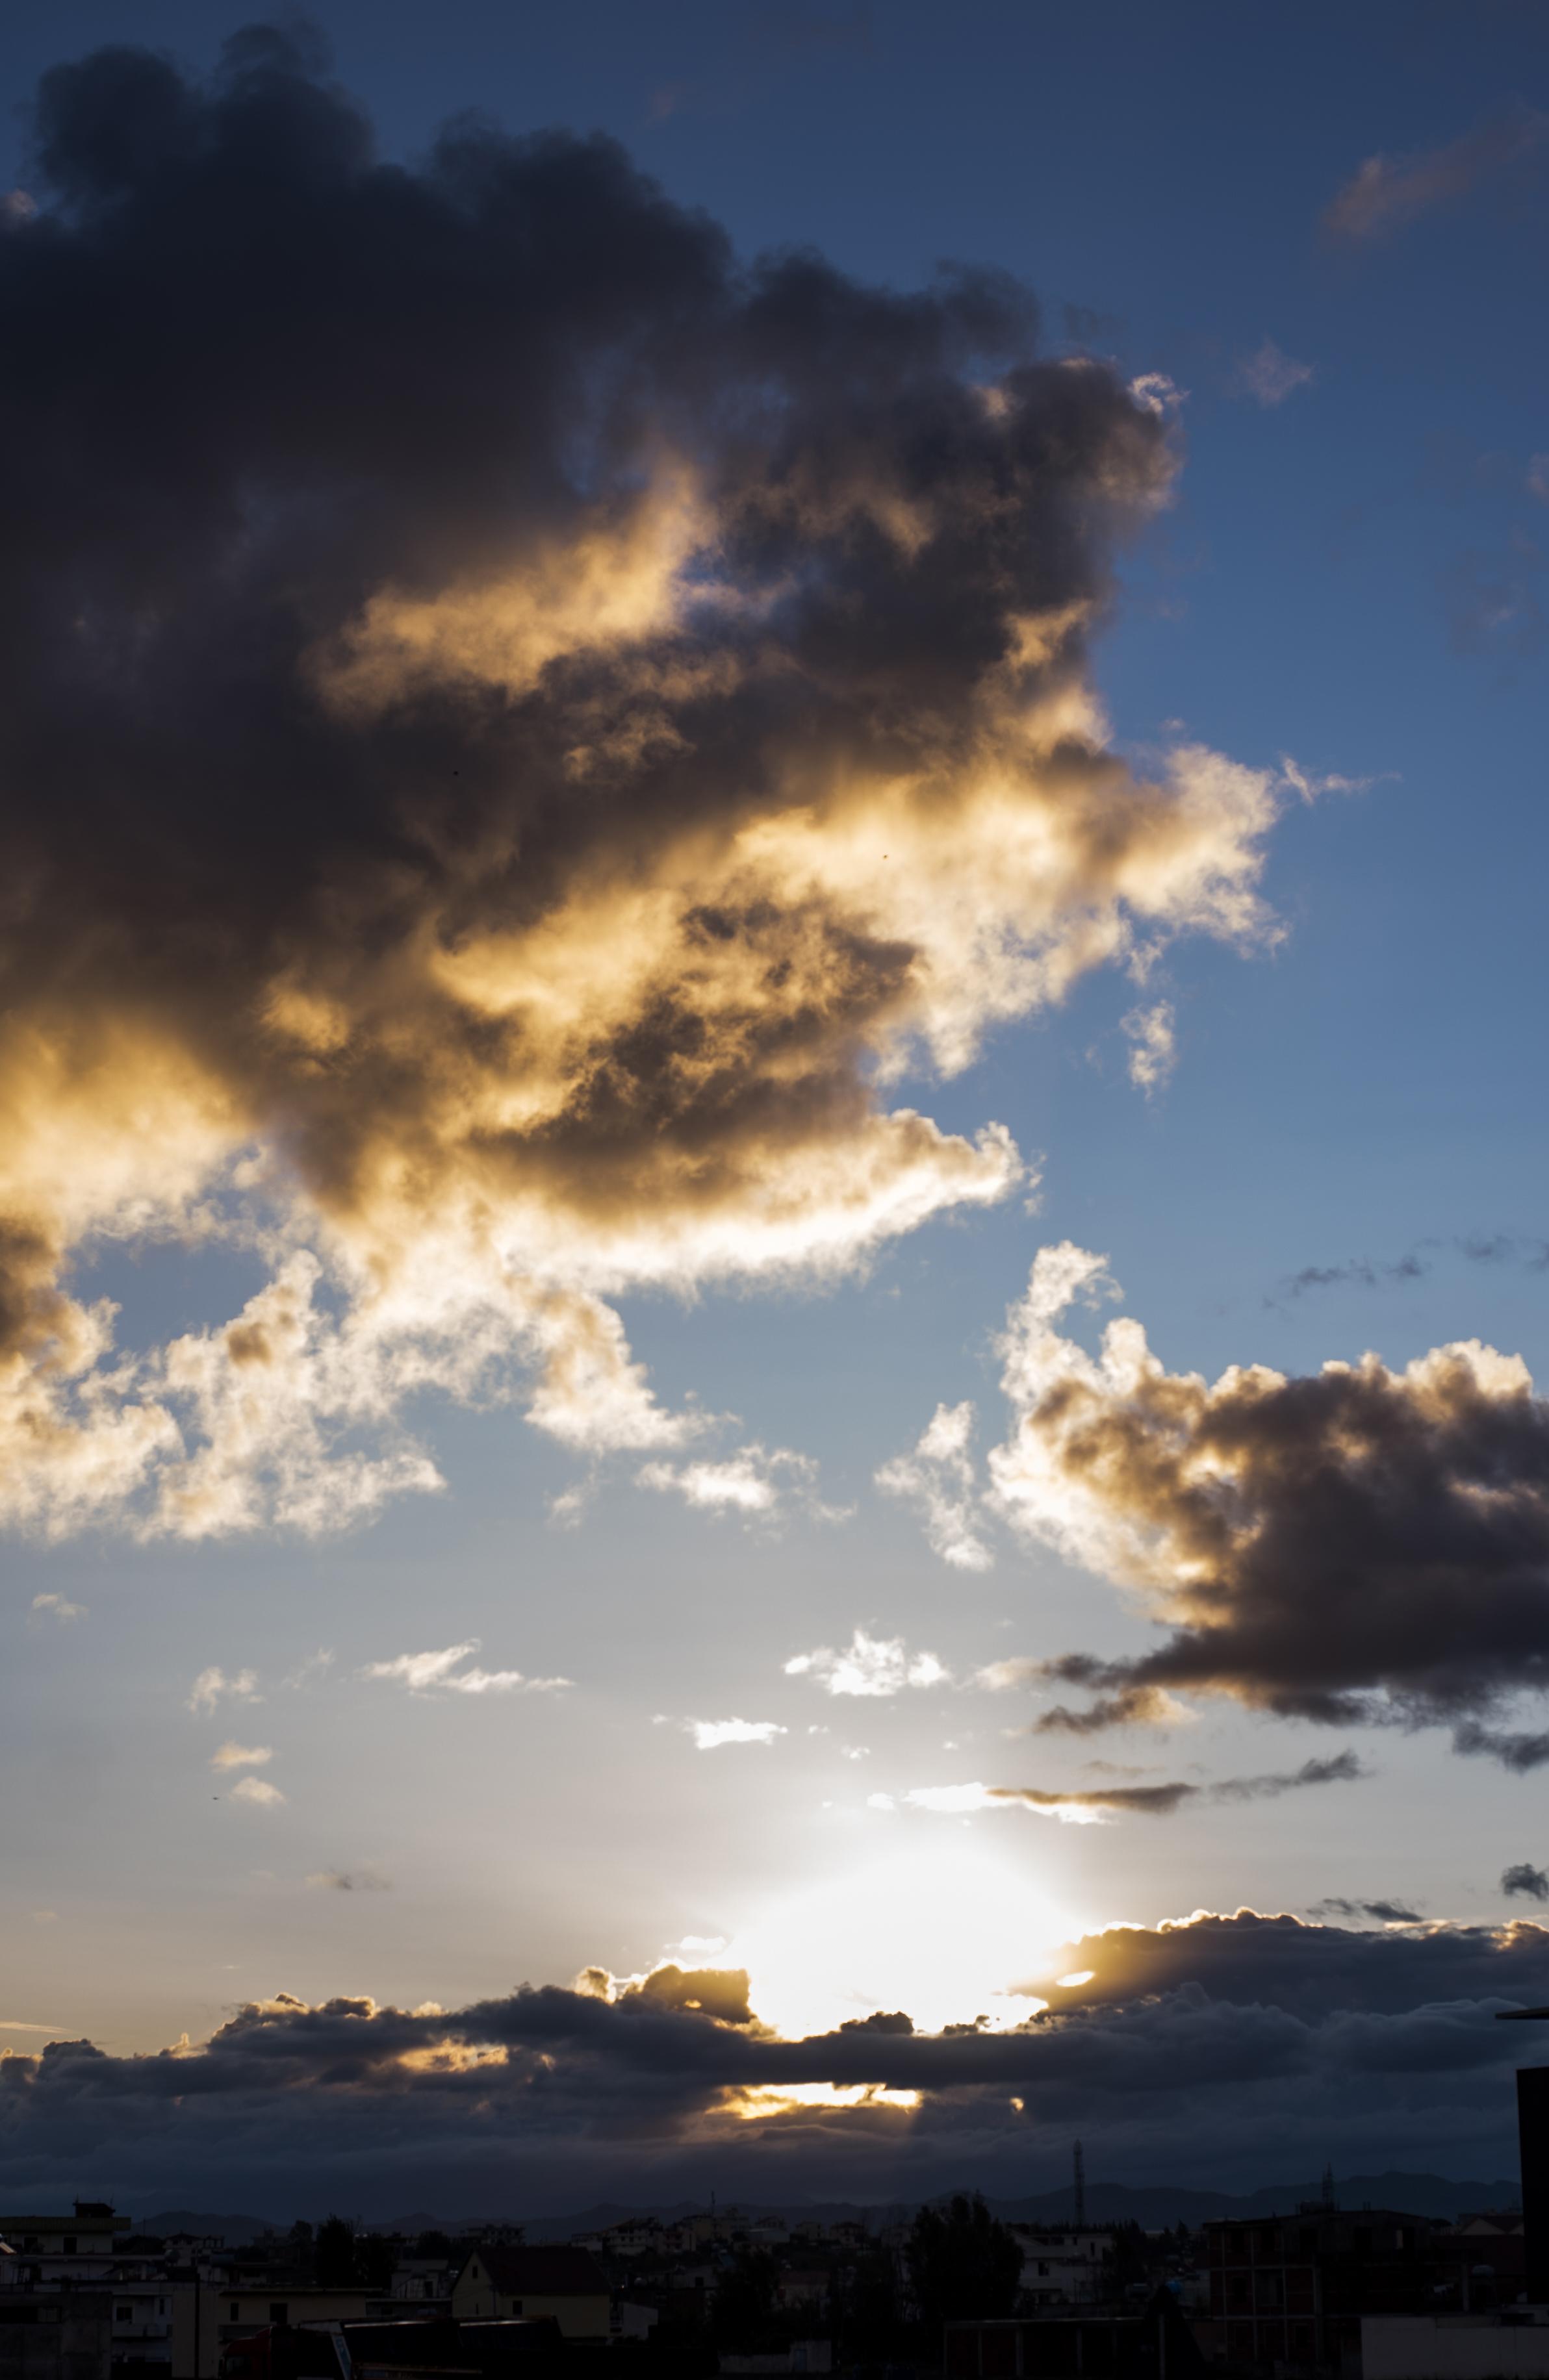 Free images landscape horizon cloud sun sunrise sunset landscape horizon cloud sky sun sunrise sunset sunlight morning dawn atmosphere dusk daytime evening cumulus calm thecheapjerseys Choice Image